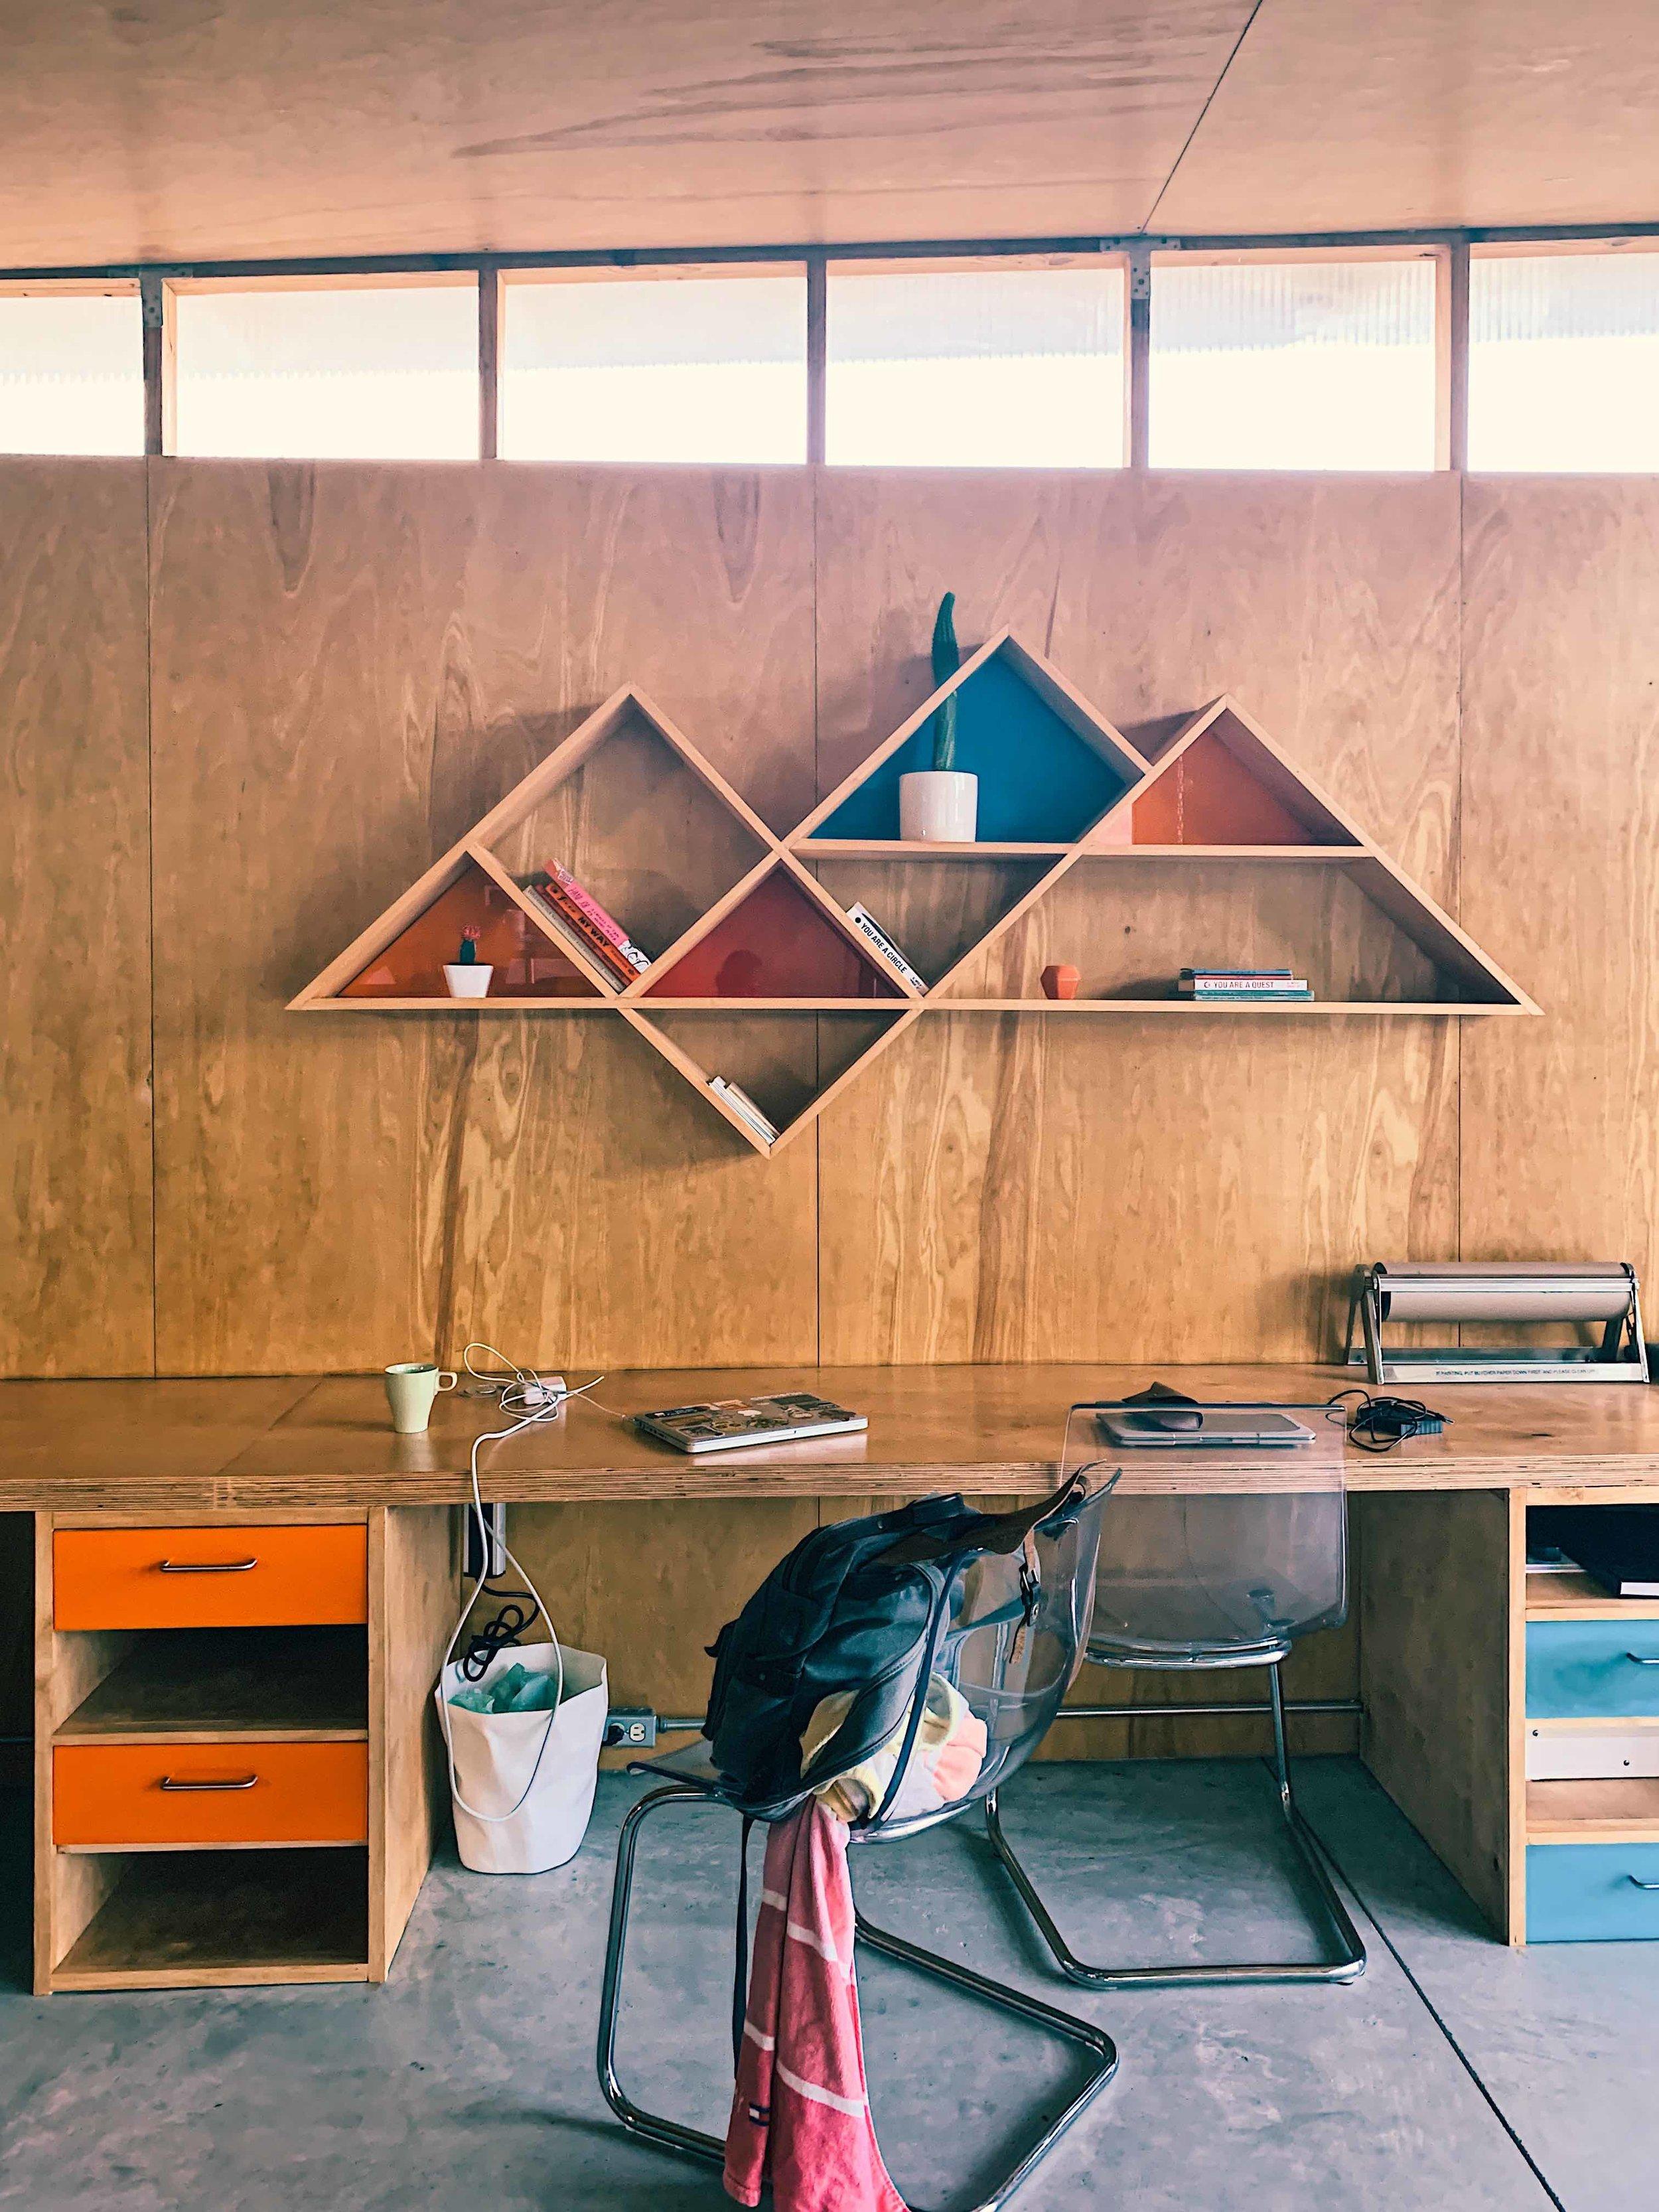 airbnb-art loft-joshua tree - cj johnson - cjjohnsonjr -4.jpg